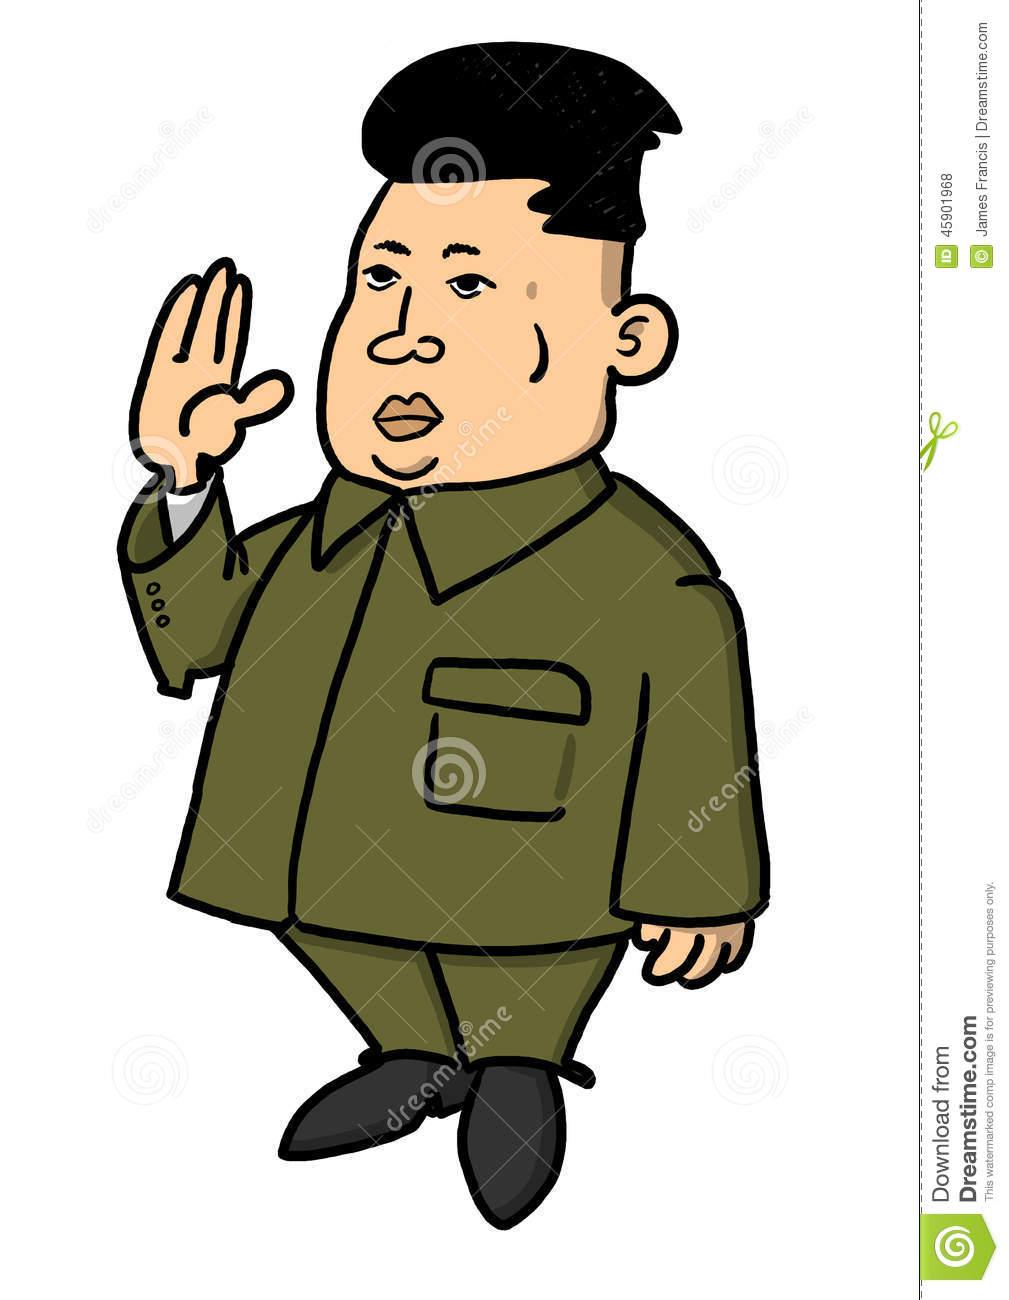 Kim Jong.